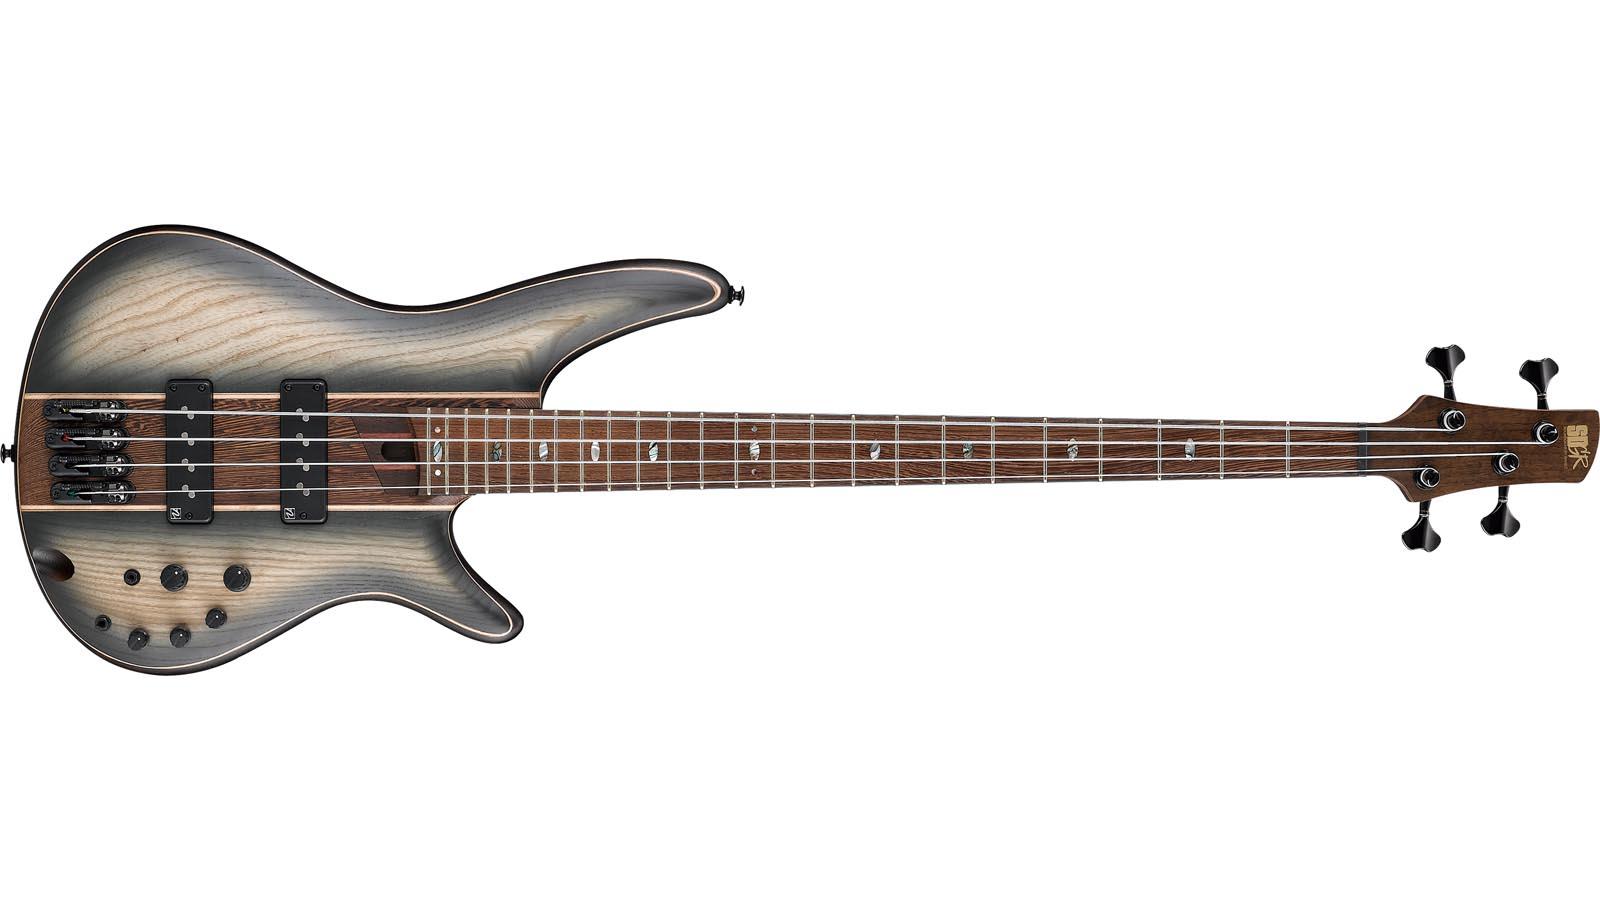 Ibanez SR1340B-DWF Bass Soundgear Dual Shadow Burst Flat